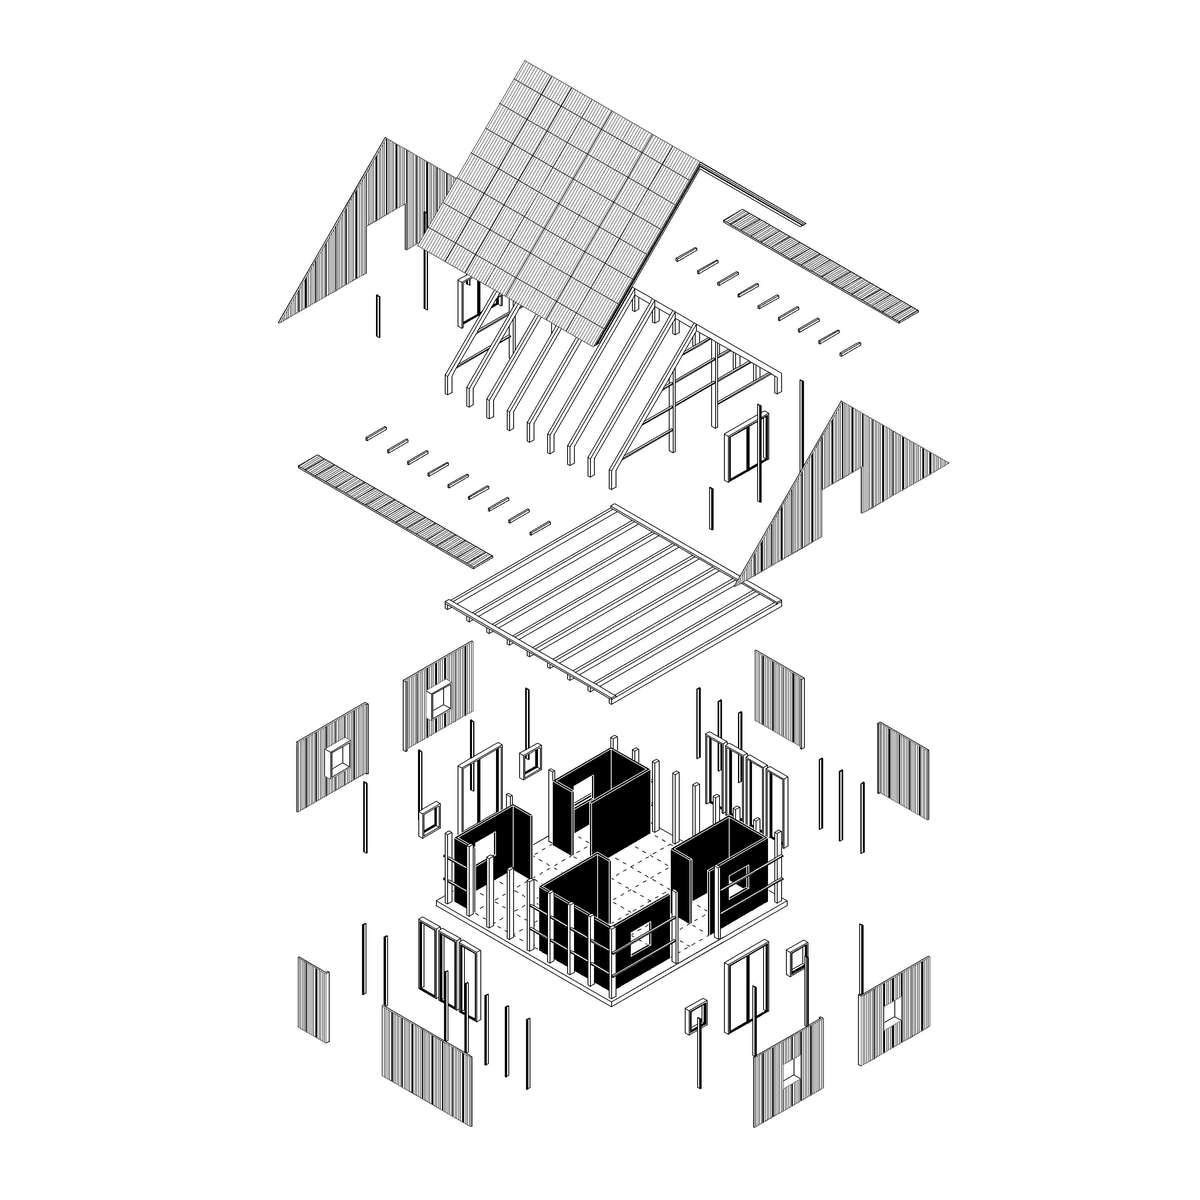 Prefab) Prototype House: :: Future Architecture on component identification, component symbols, component audio, component architecture, component parts, component wire, component cartoon, component form, component icon,